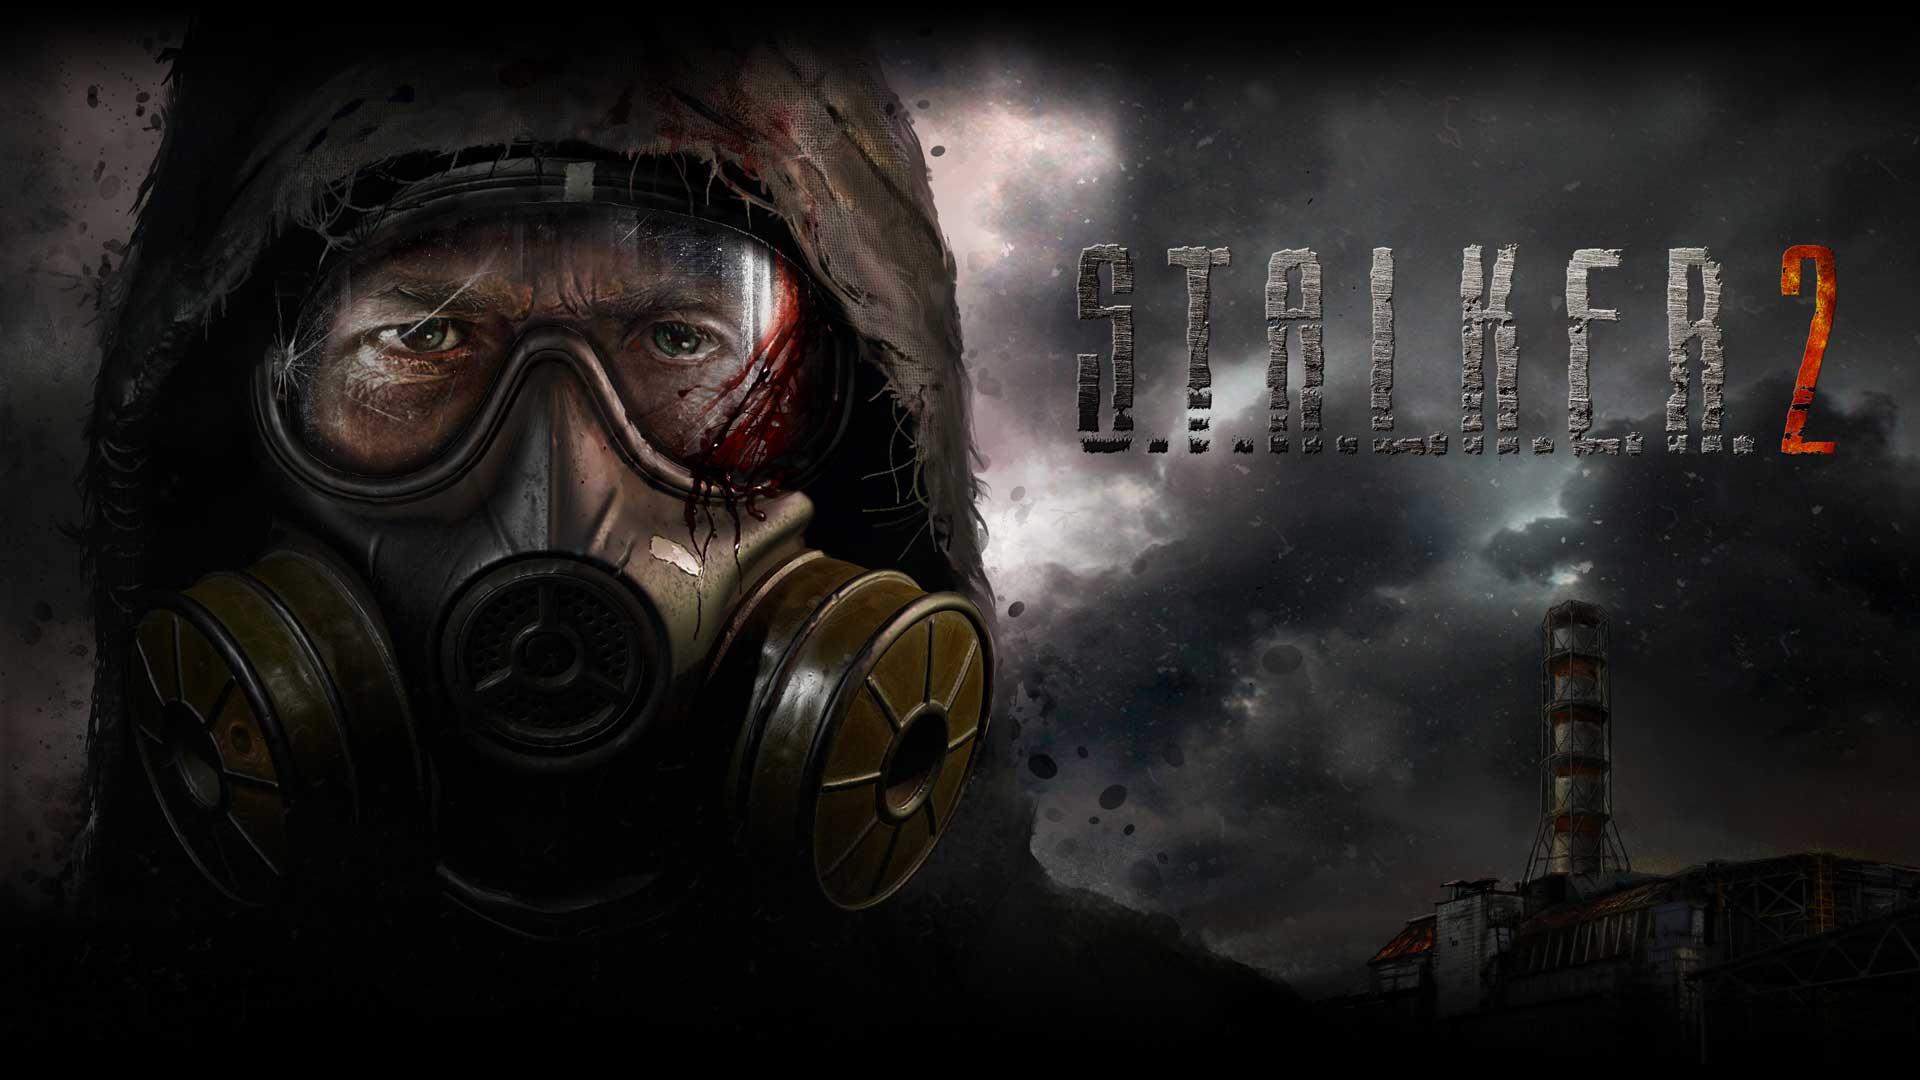 stalker 2 logo